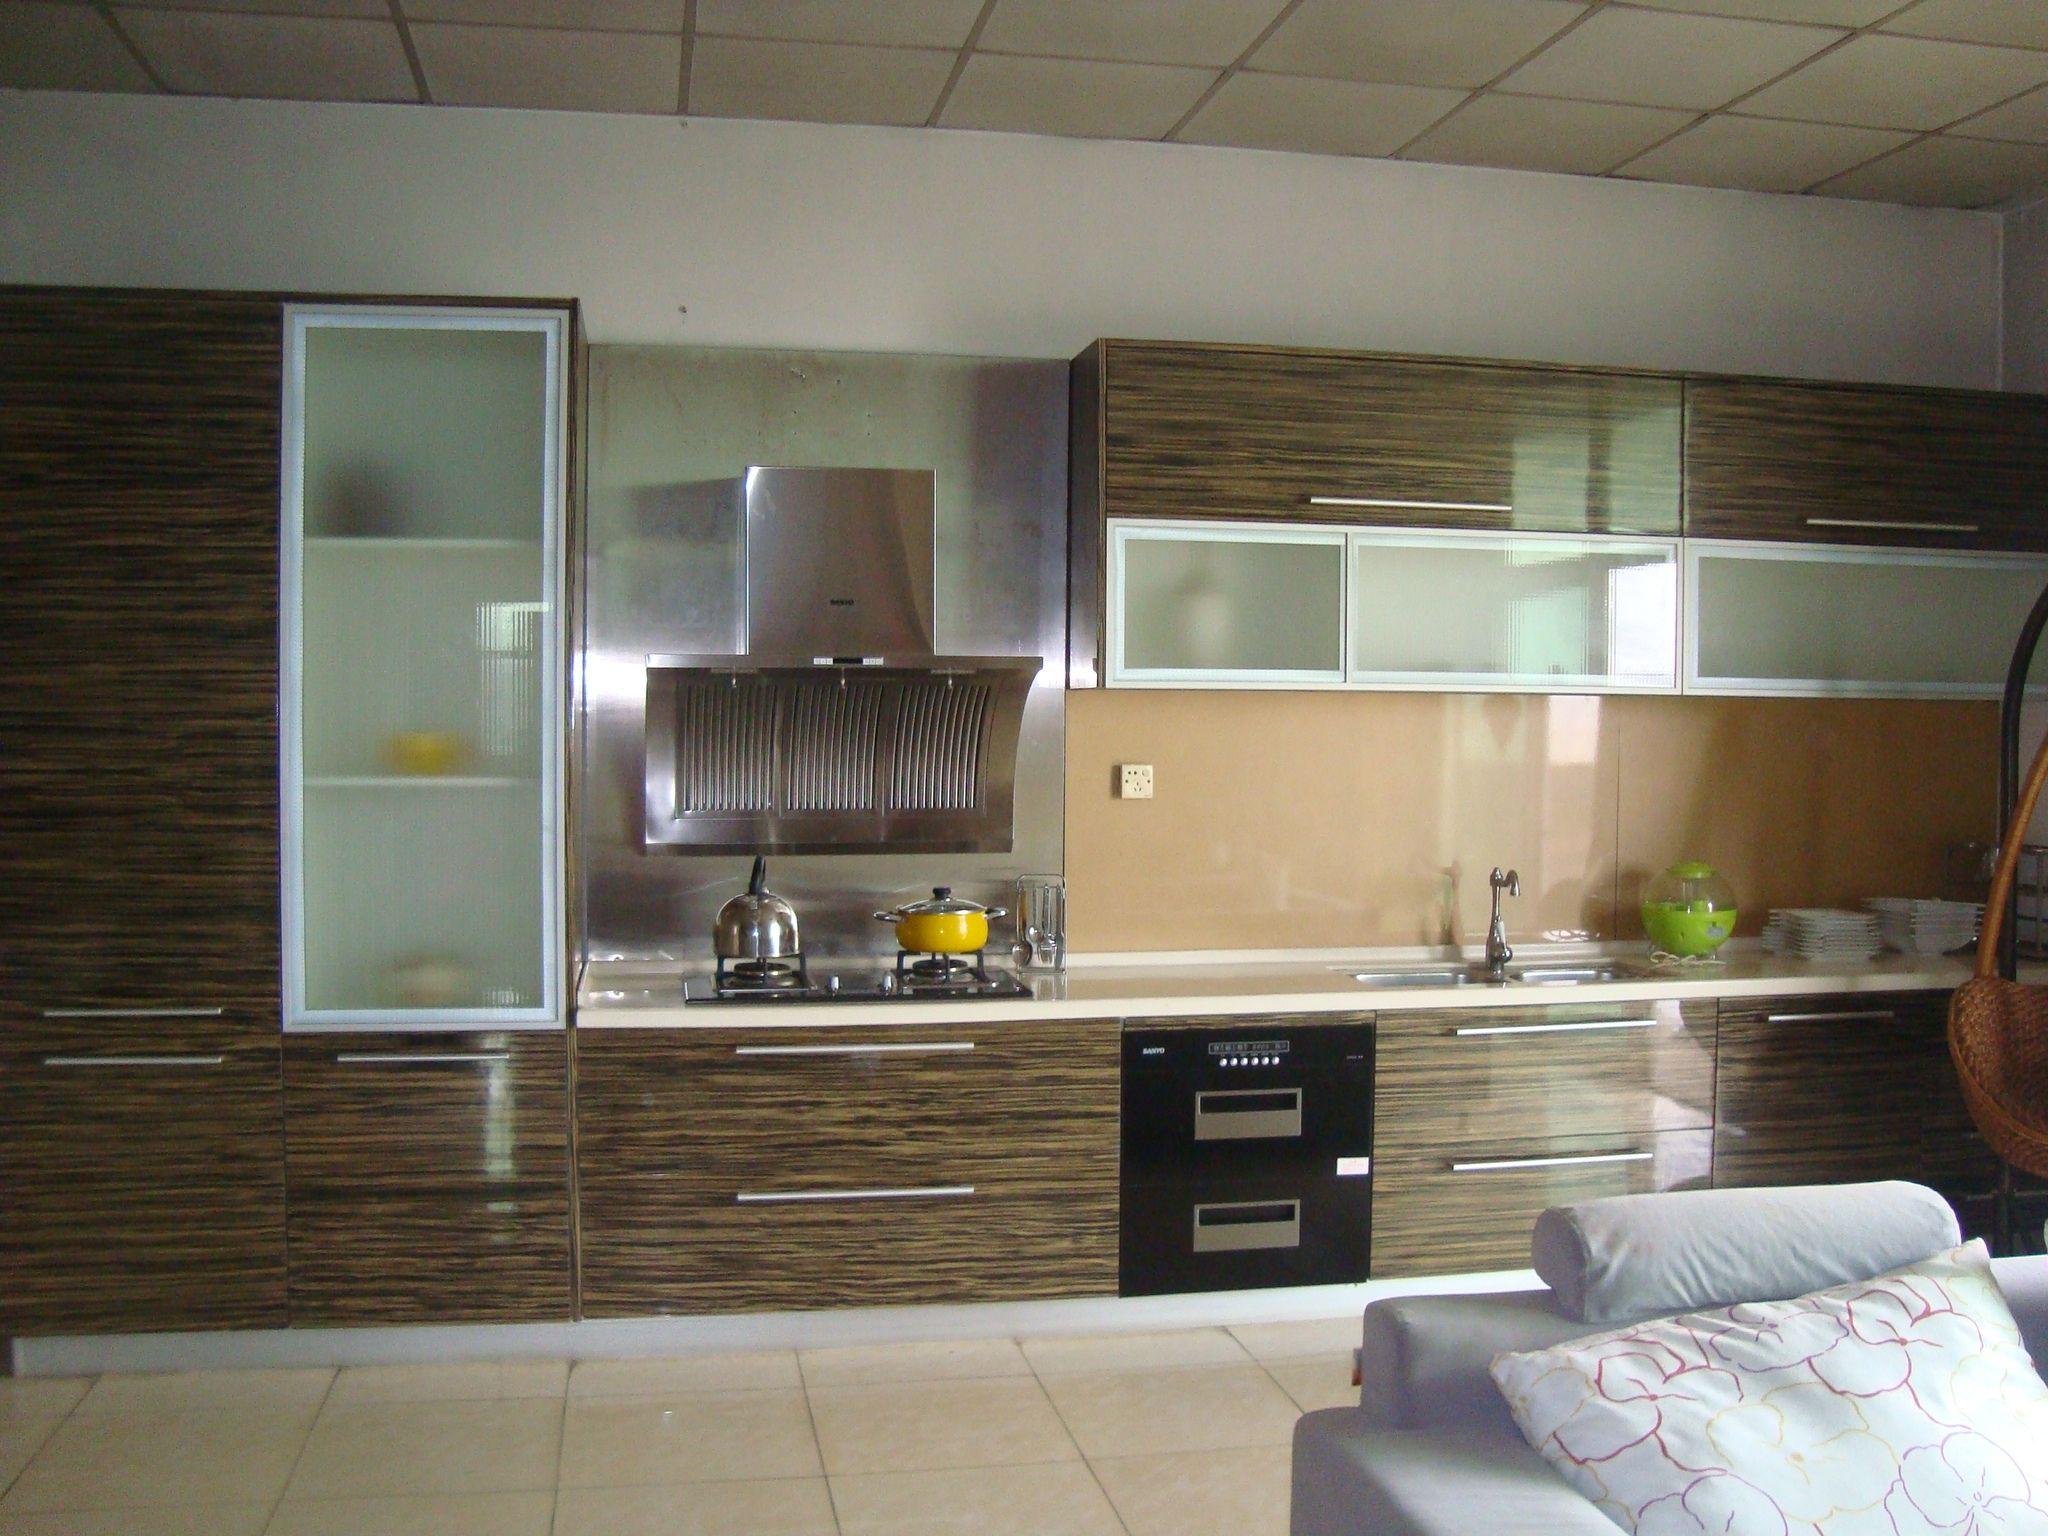 Laminate Veneer For Kitchen Cabinets | Kitchen Cabinets | Pinterest ...